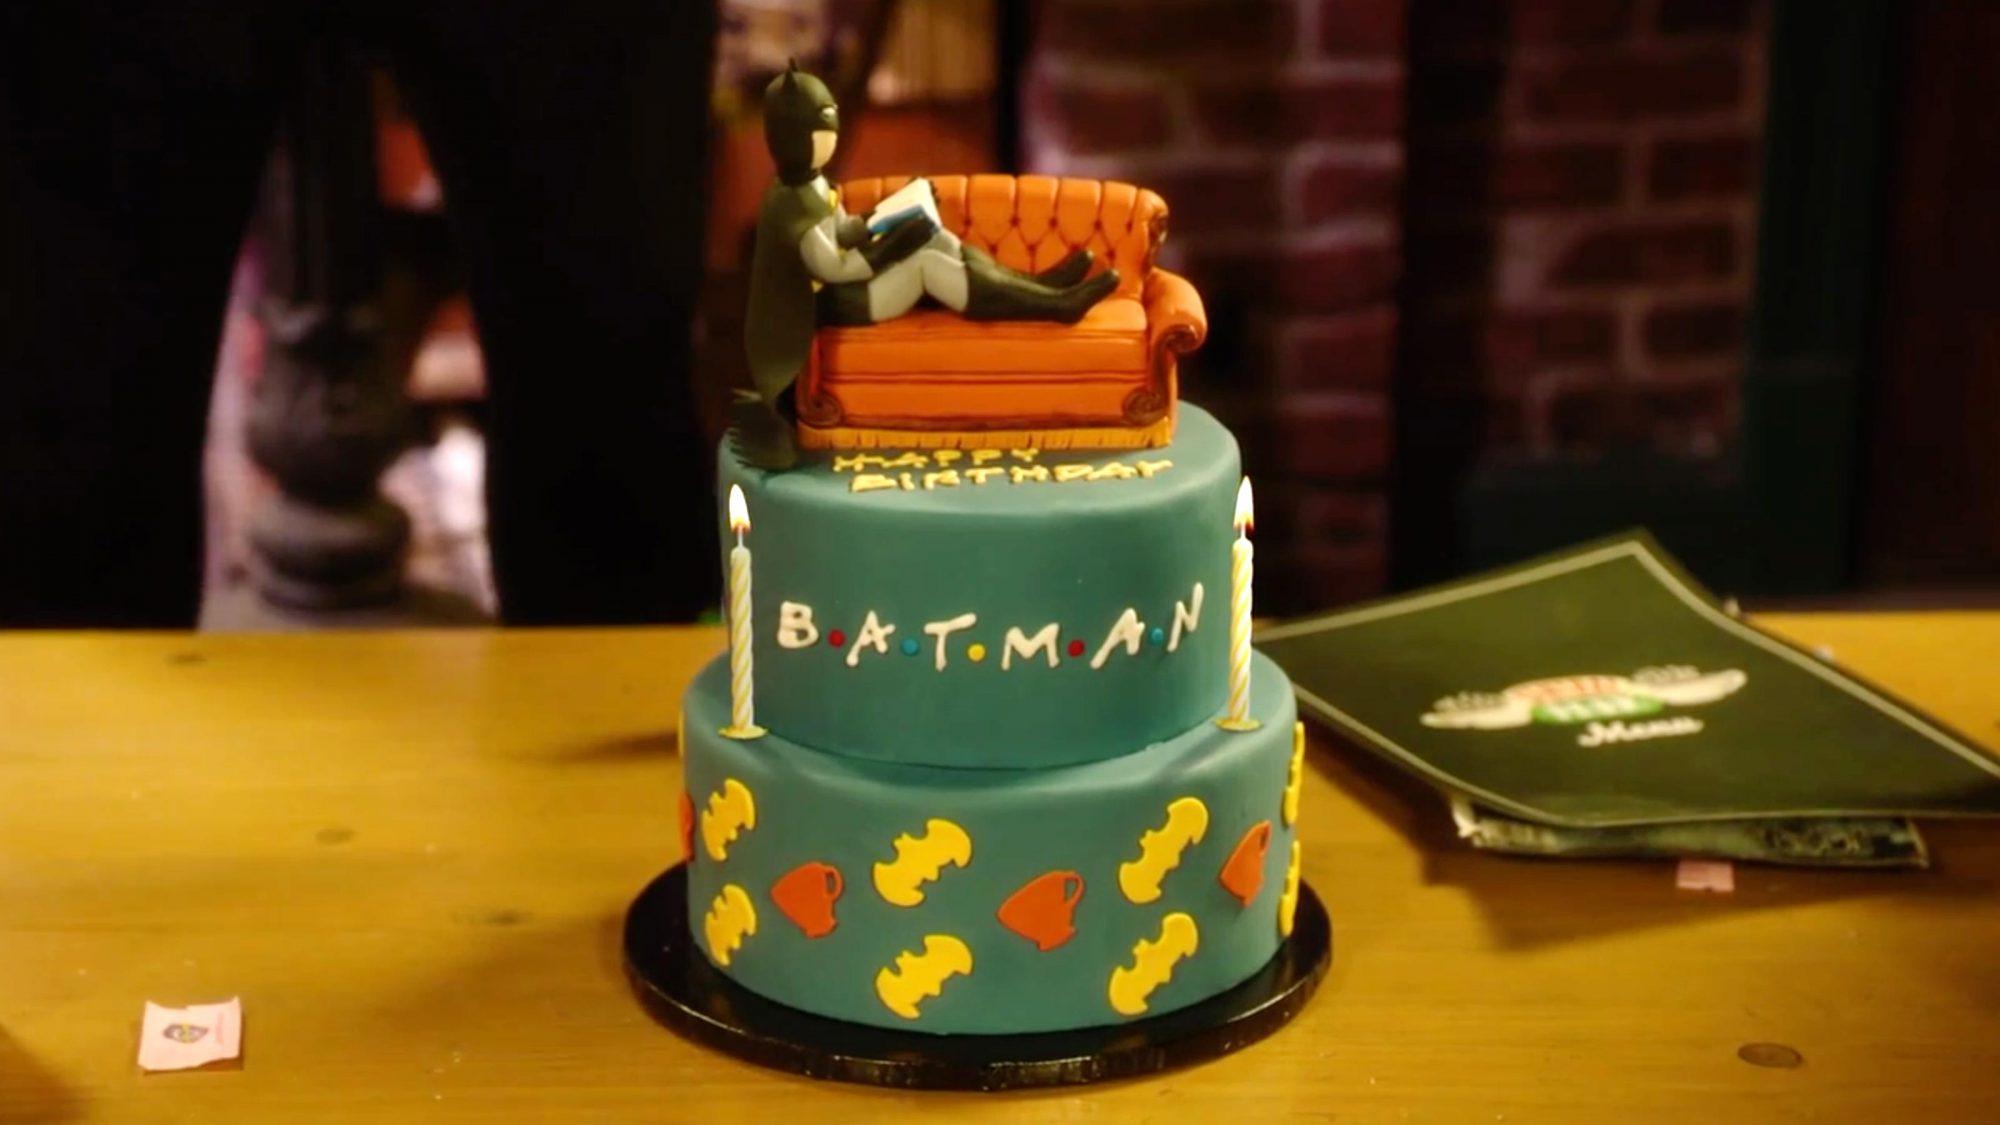 Batman and Friends Birthday